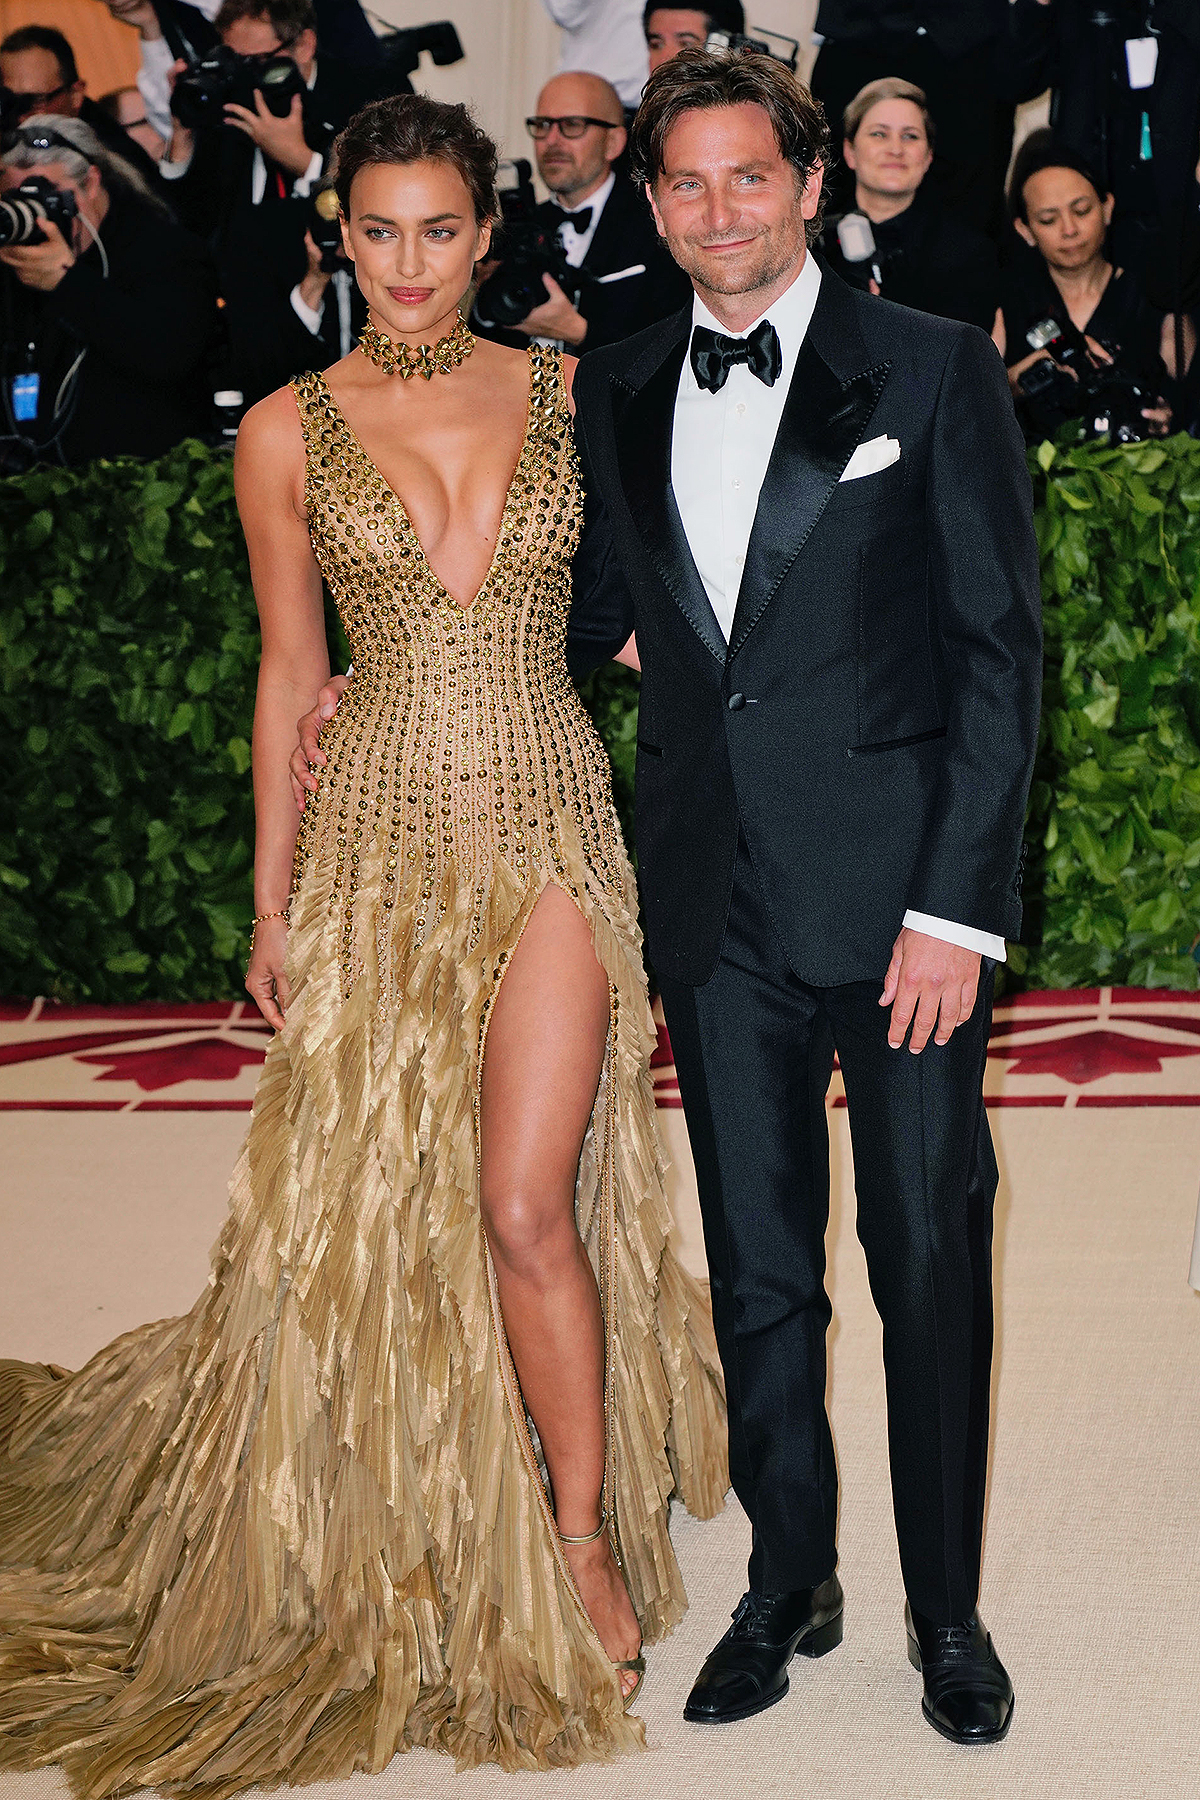 Bradley Cooper and Irina Shayk split after 4 years